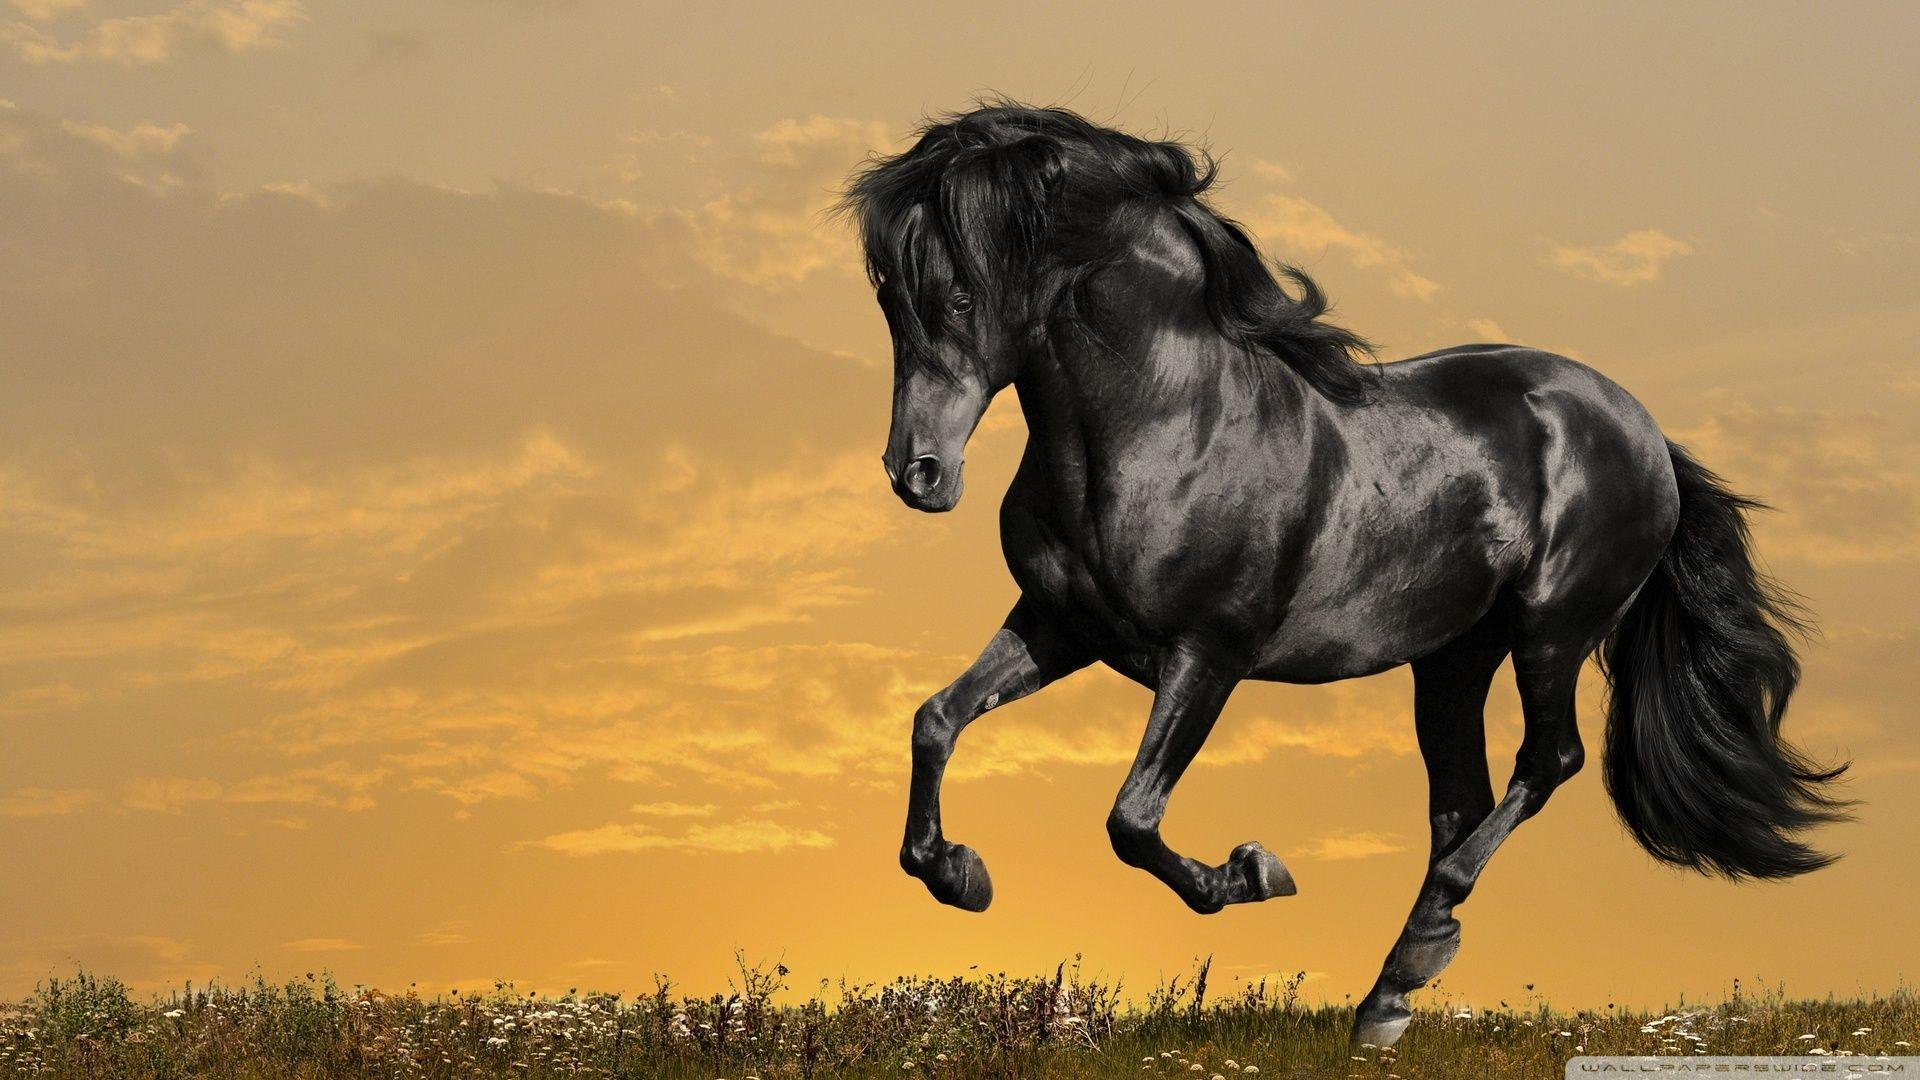 Running Horse Hd Wallpaper Download High Quality Wallpaper Buddy